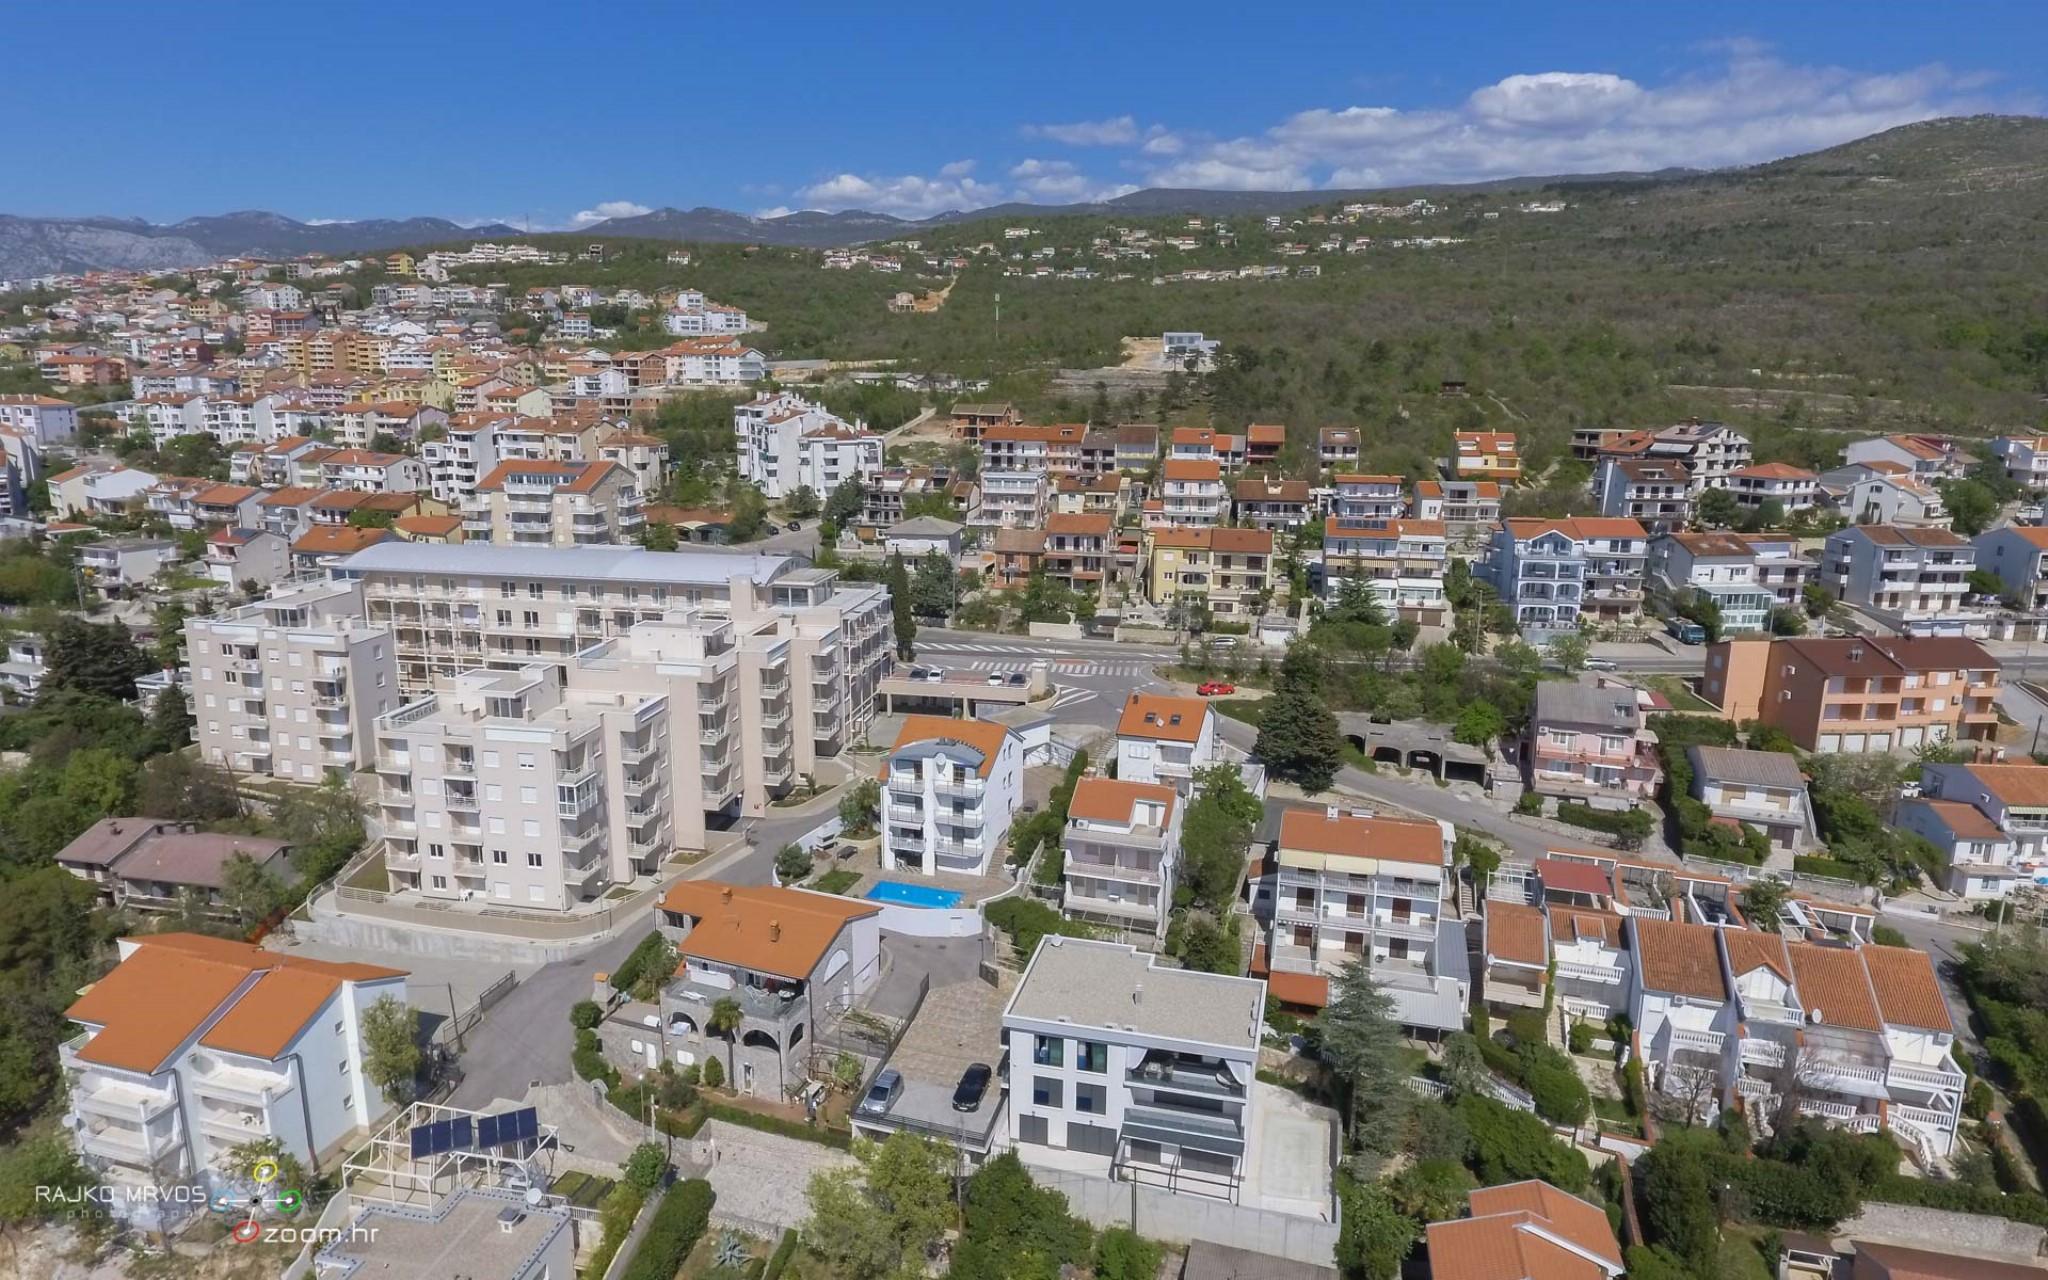 fotografiranje-iz-zraka-eksterijera-dronom-vila-kuca-hotela-apartmana-Larimar-Penthouse-52